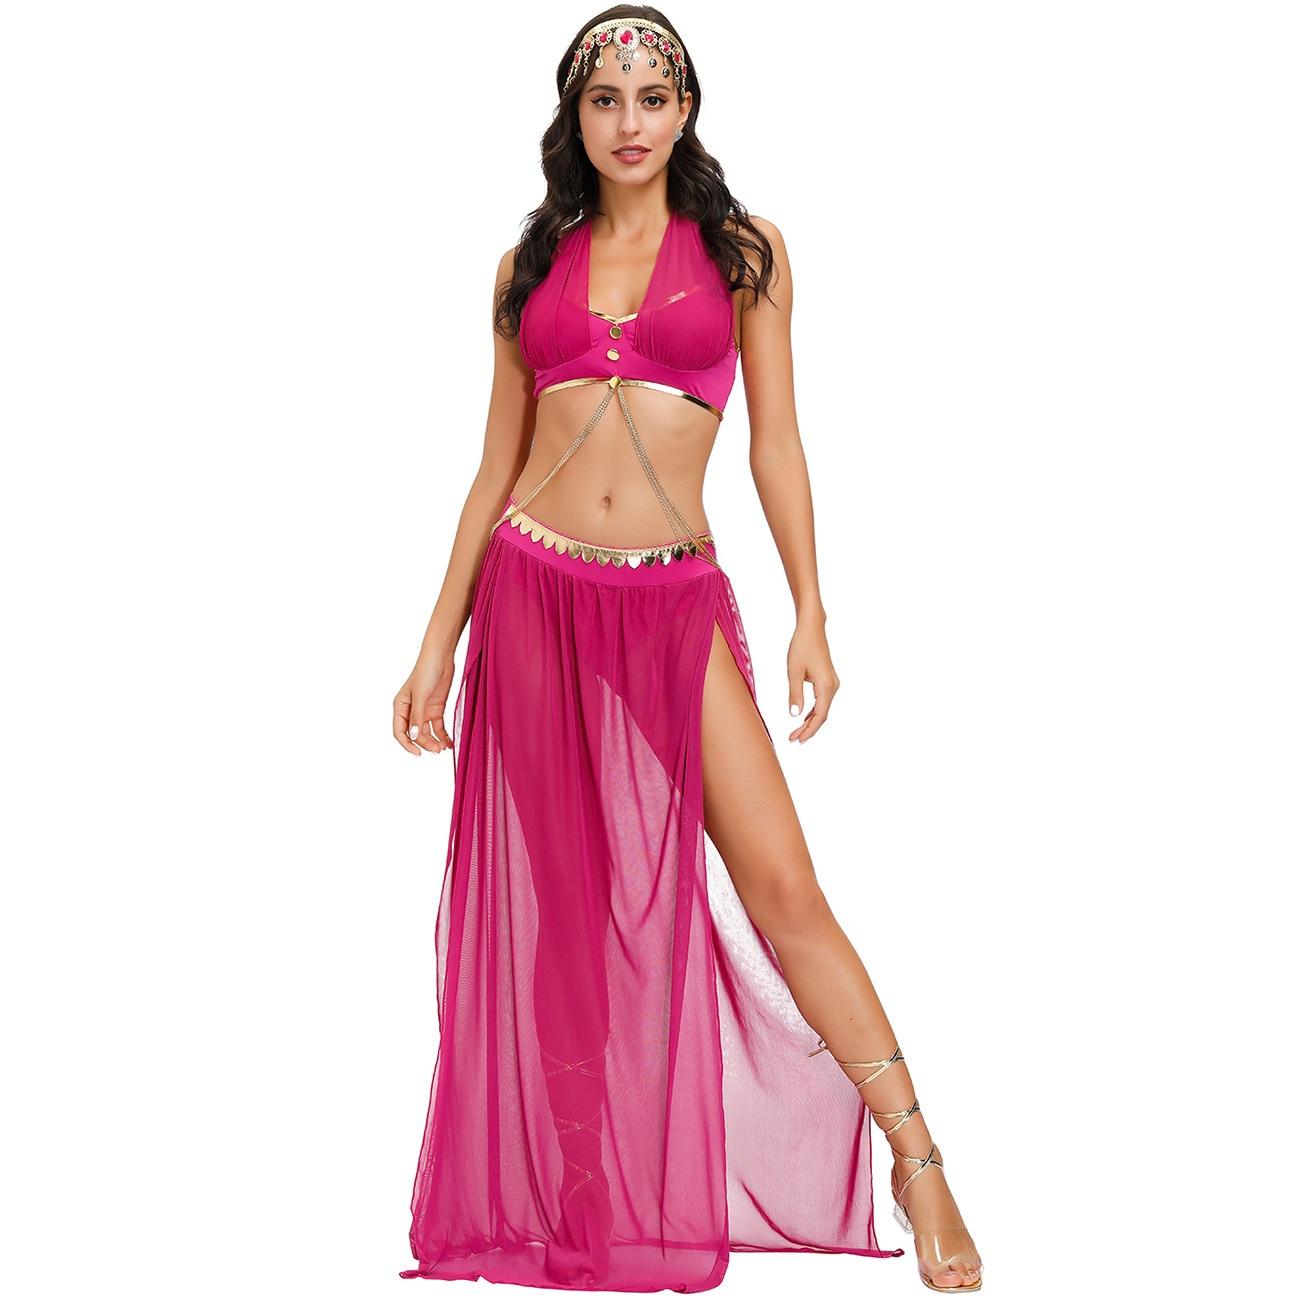 Vestido de princesa para Halloween, cosplay, bailarinas indias femeninas, all saints of...